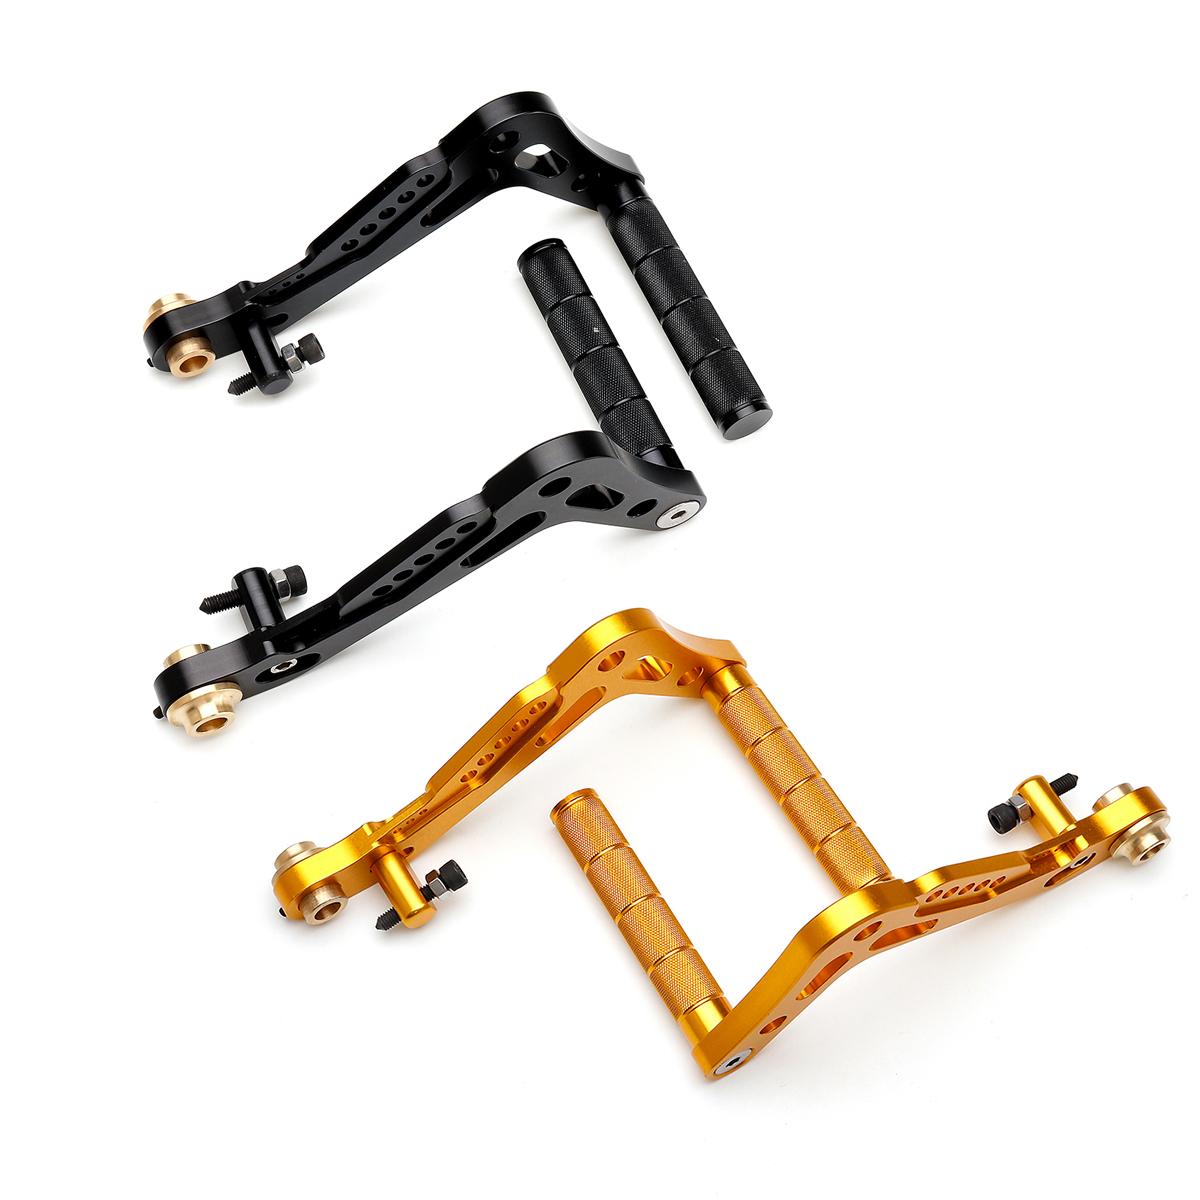 CNC Billet Aluminum Adjustable Go Kart Pedals Brake Accelerator Foot Peg Set New